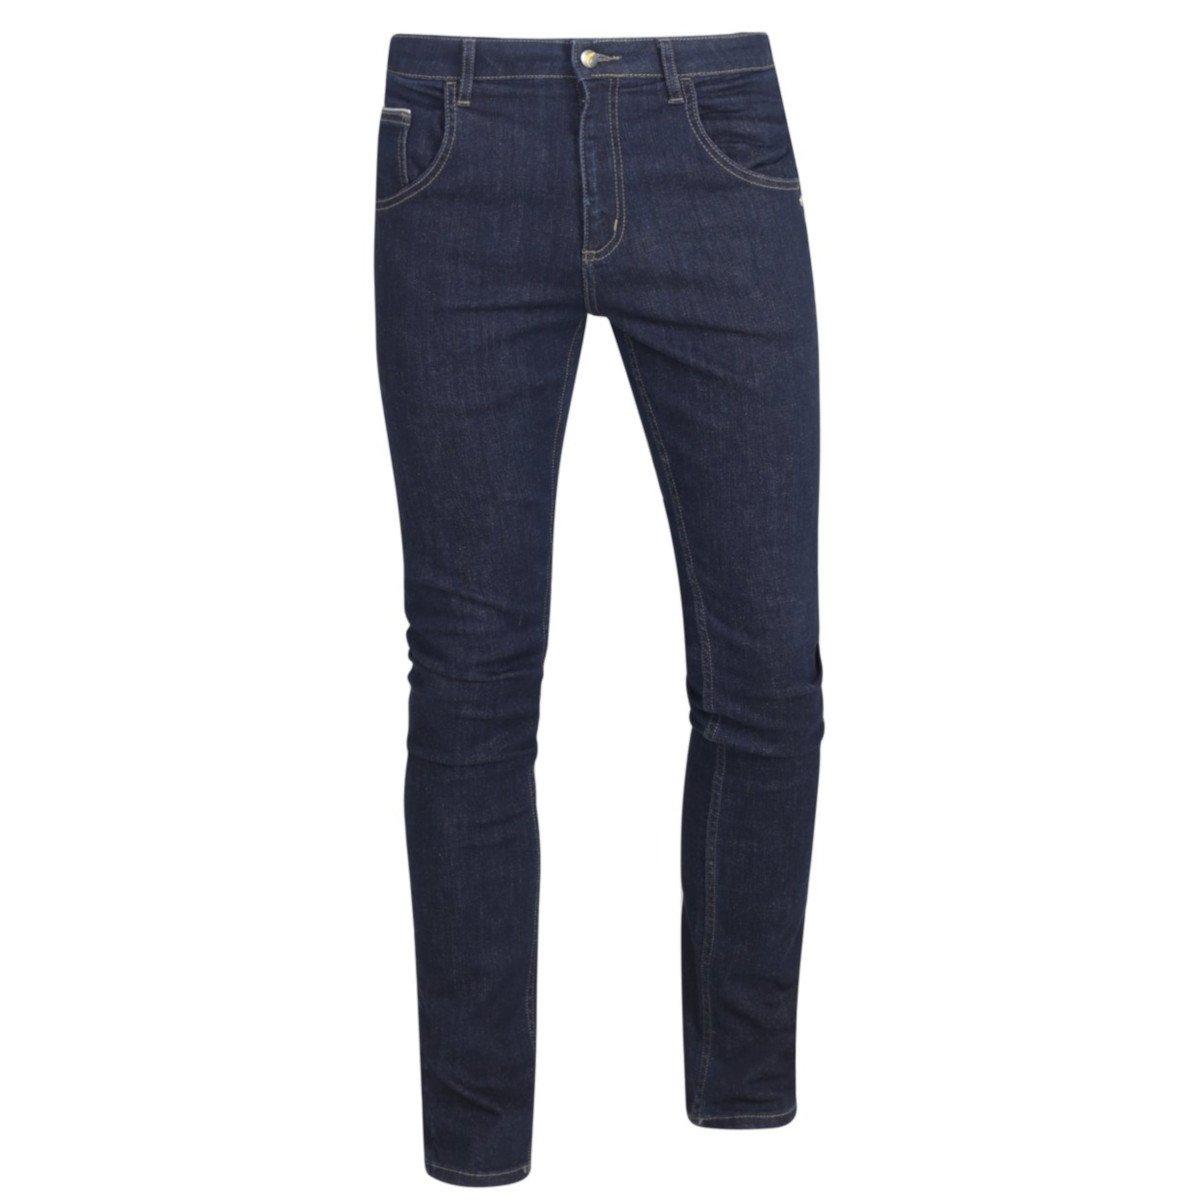 Jeans Dean Slim Fit Rinse cotone biologico